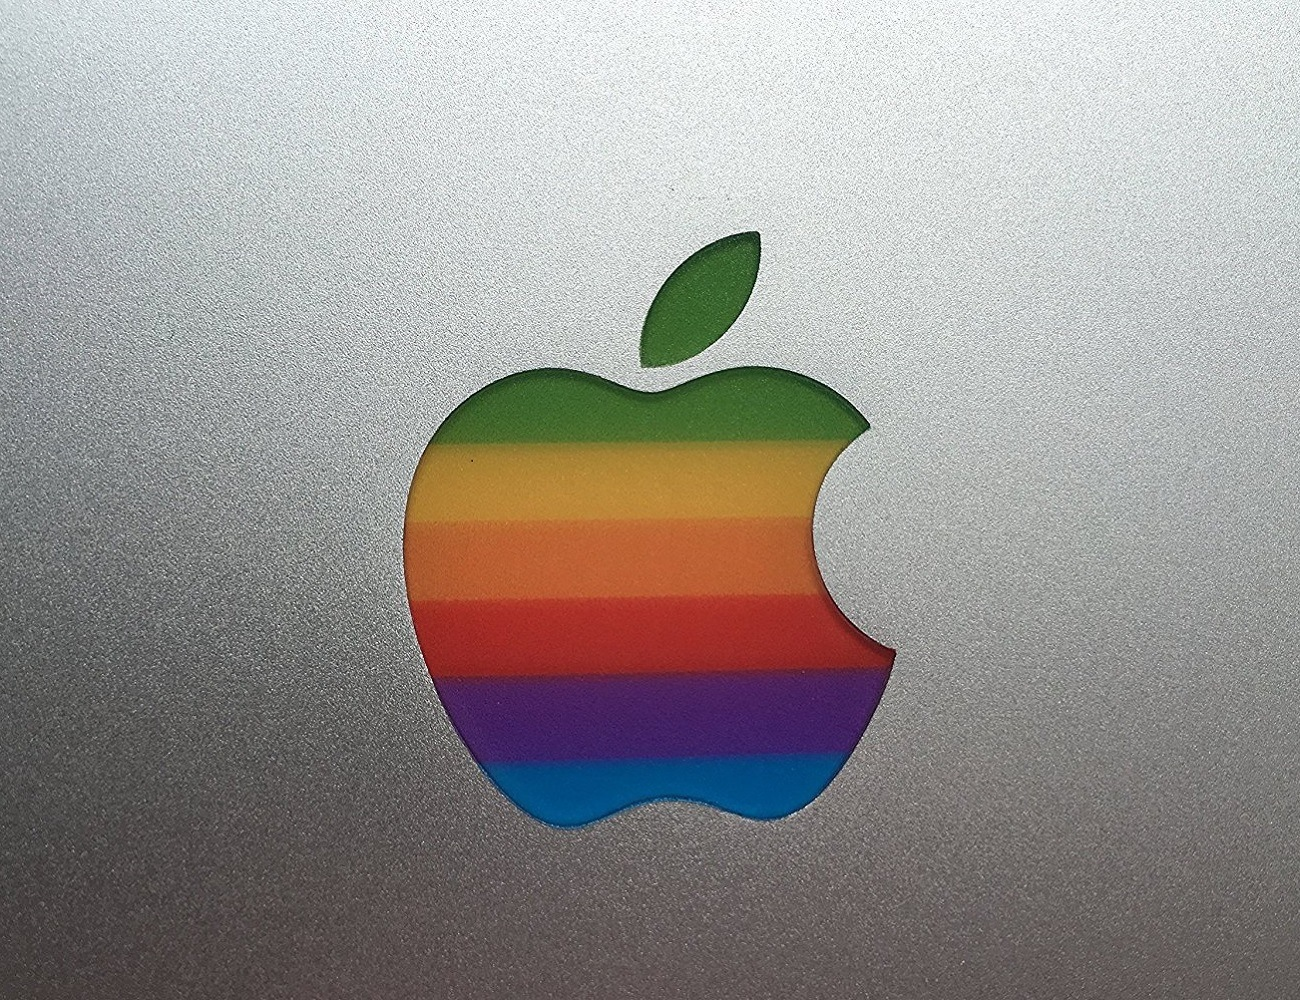 retro apple logo sticker gadget flow